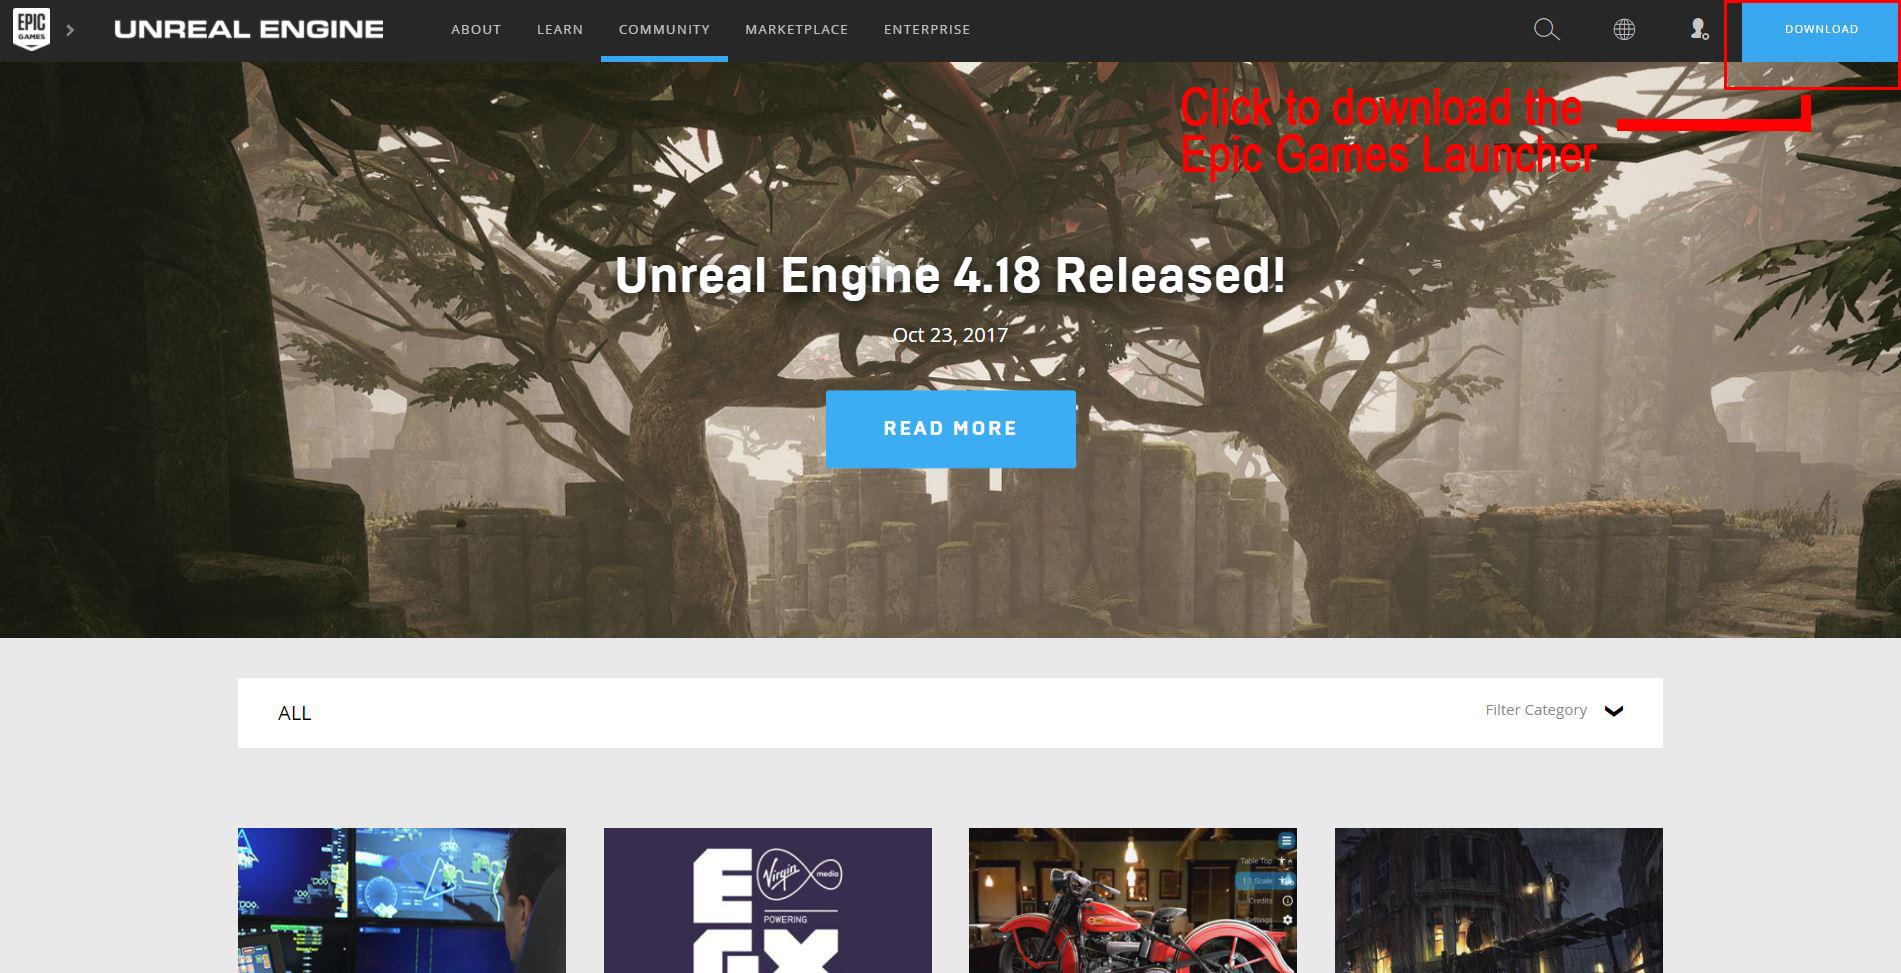 GitHub - udacity/Unreal-Advanced-Project-Template: Unreal